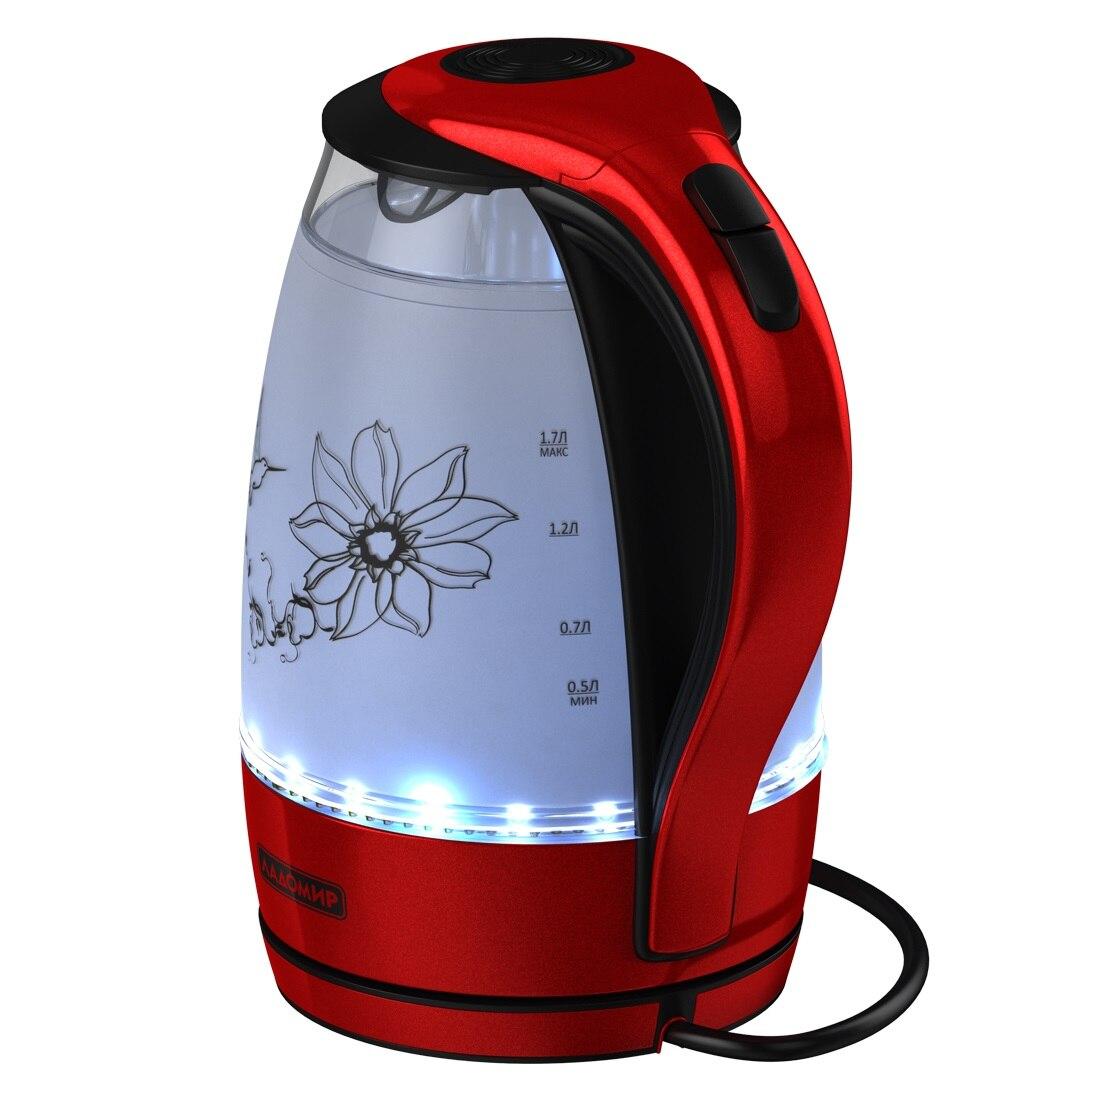 Electric kettle Ladomir 133